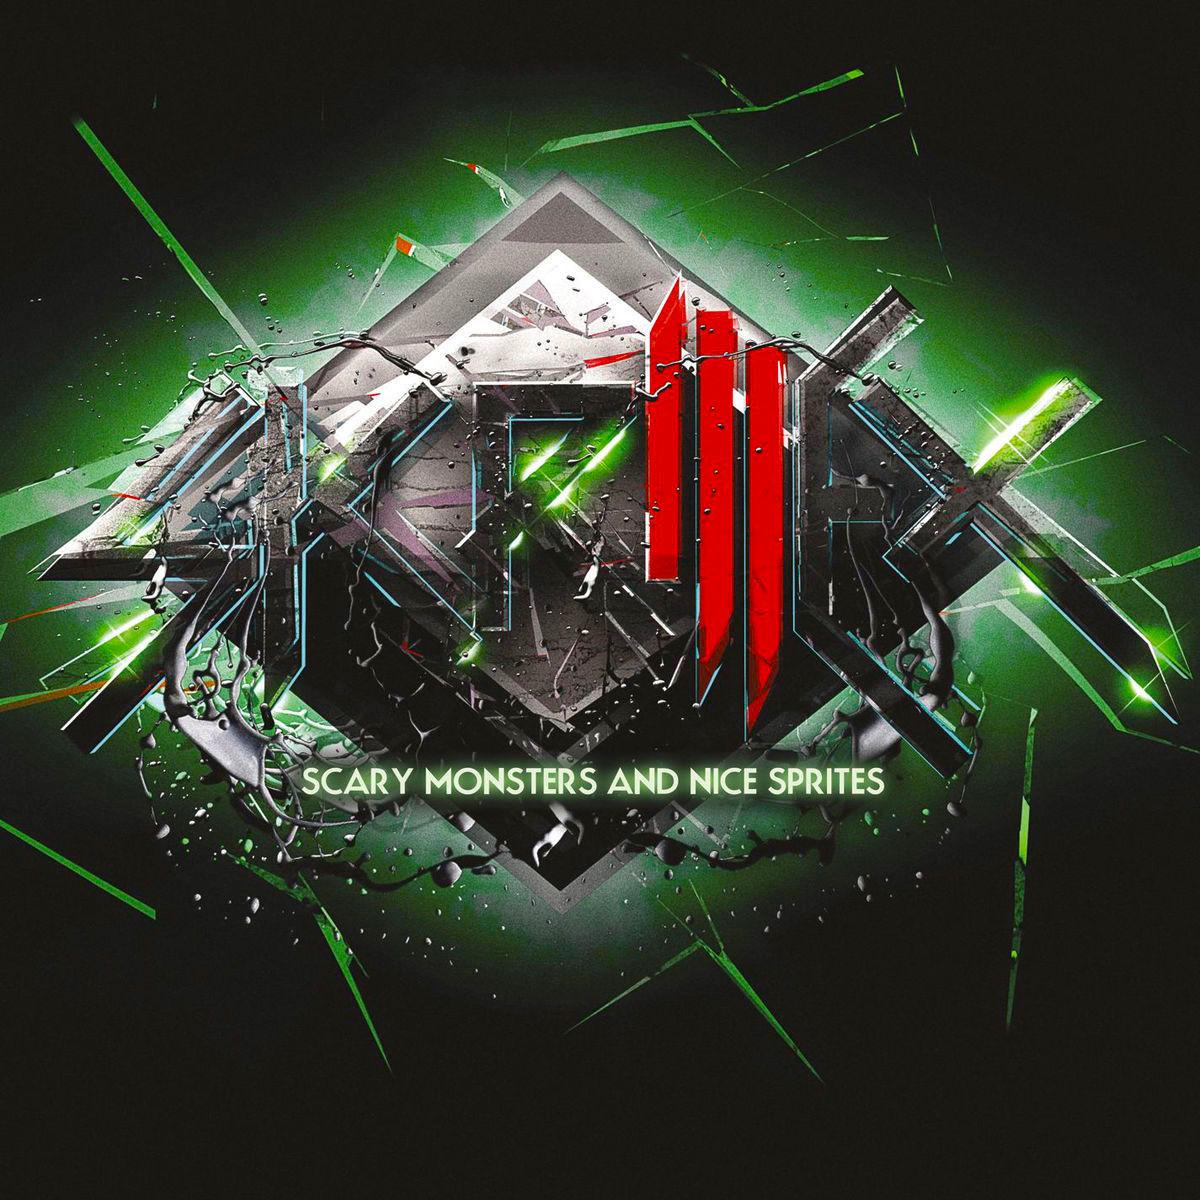 Scary Monsters & Nice Sprites - Skrillex